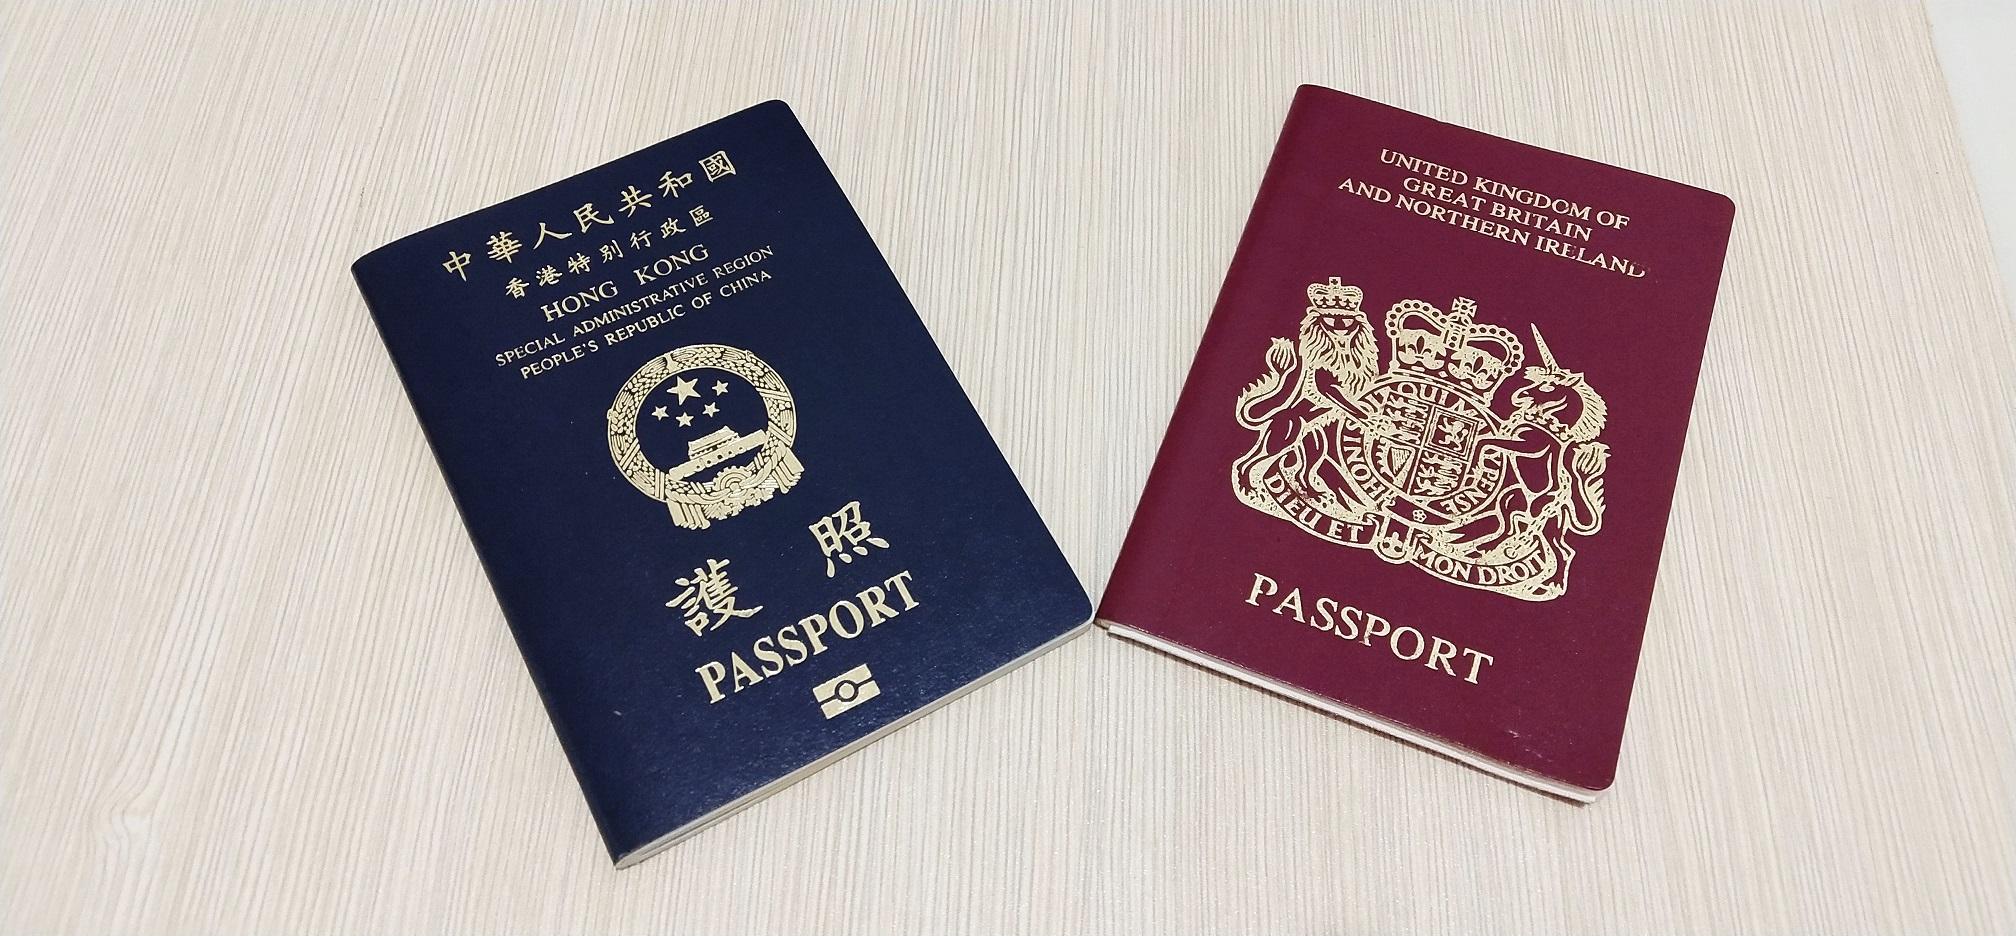 Hong Kong SAR passport and BNO passport